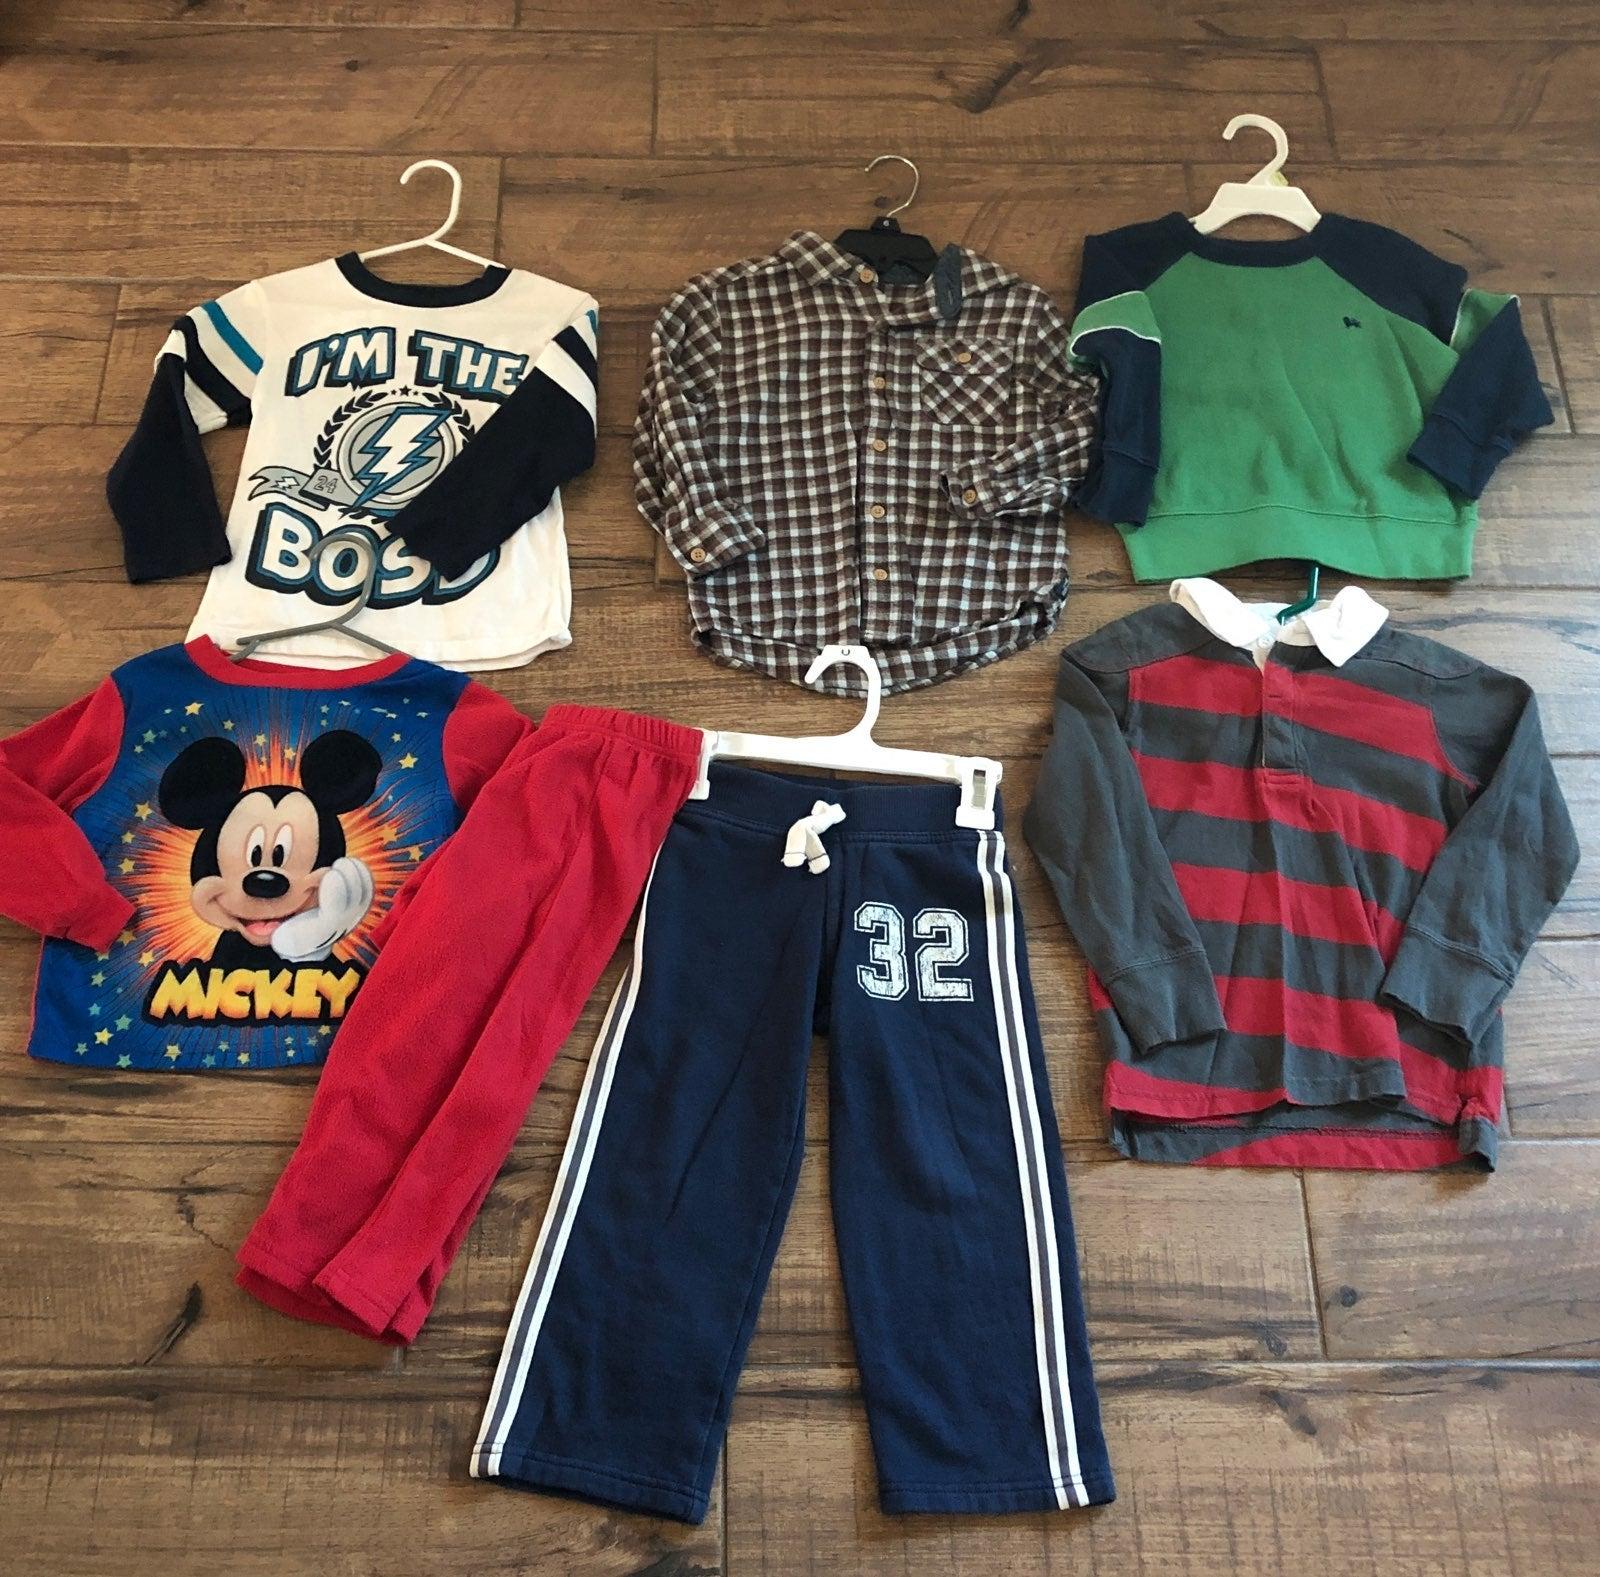 Boys Size 3T Clothing Lot